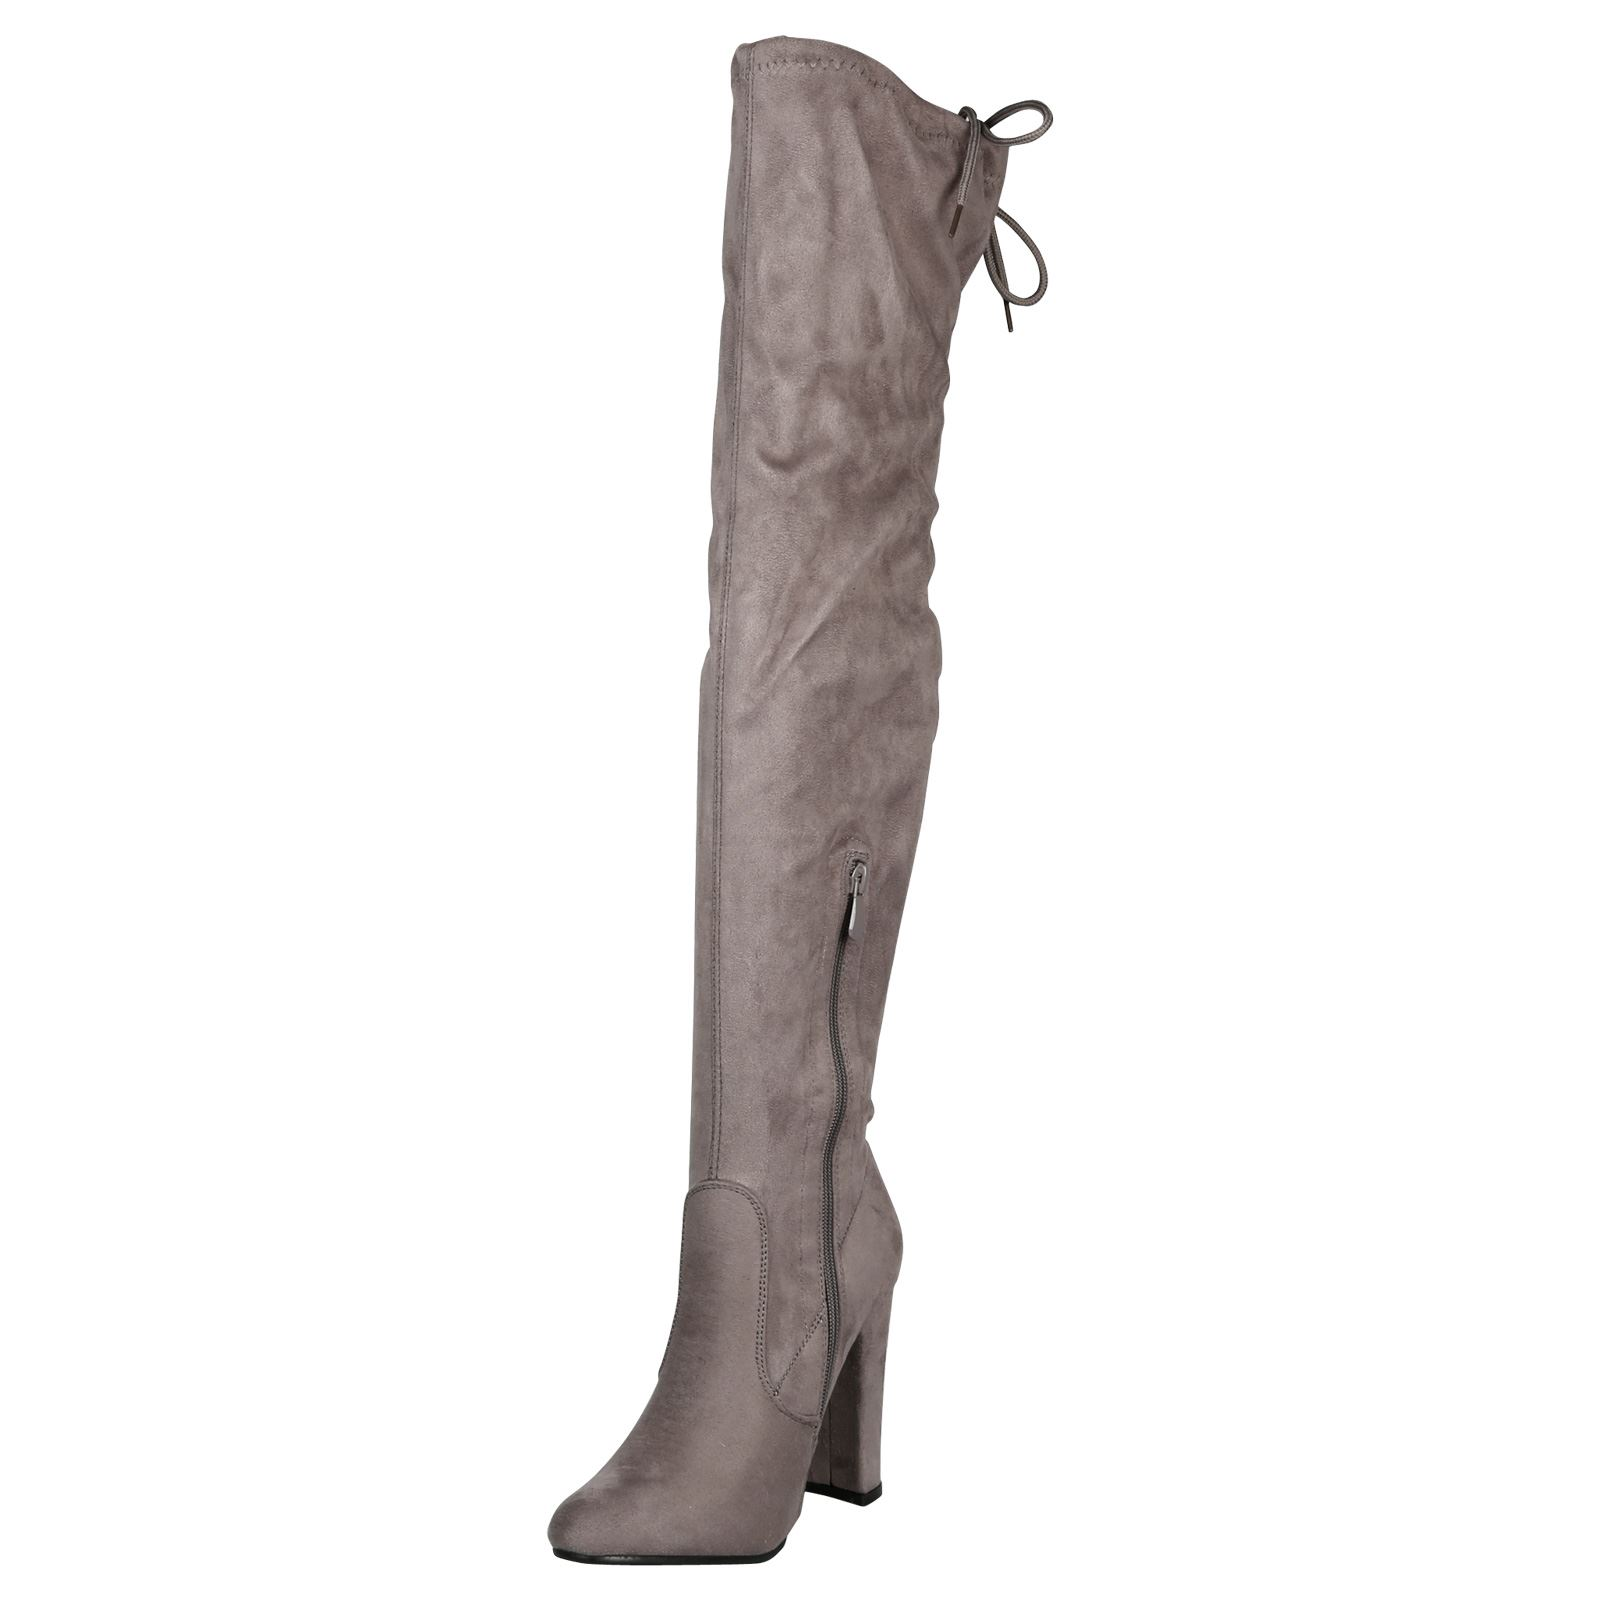 Iliana-Womens-Knee-High-Zip-Up-Adjustable-Pull-Strings-Mid-High-Block-Heel-Boots thumbnail 12